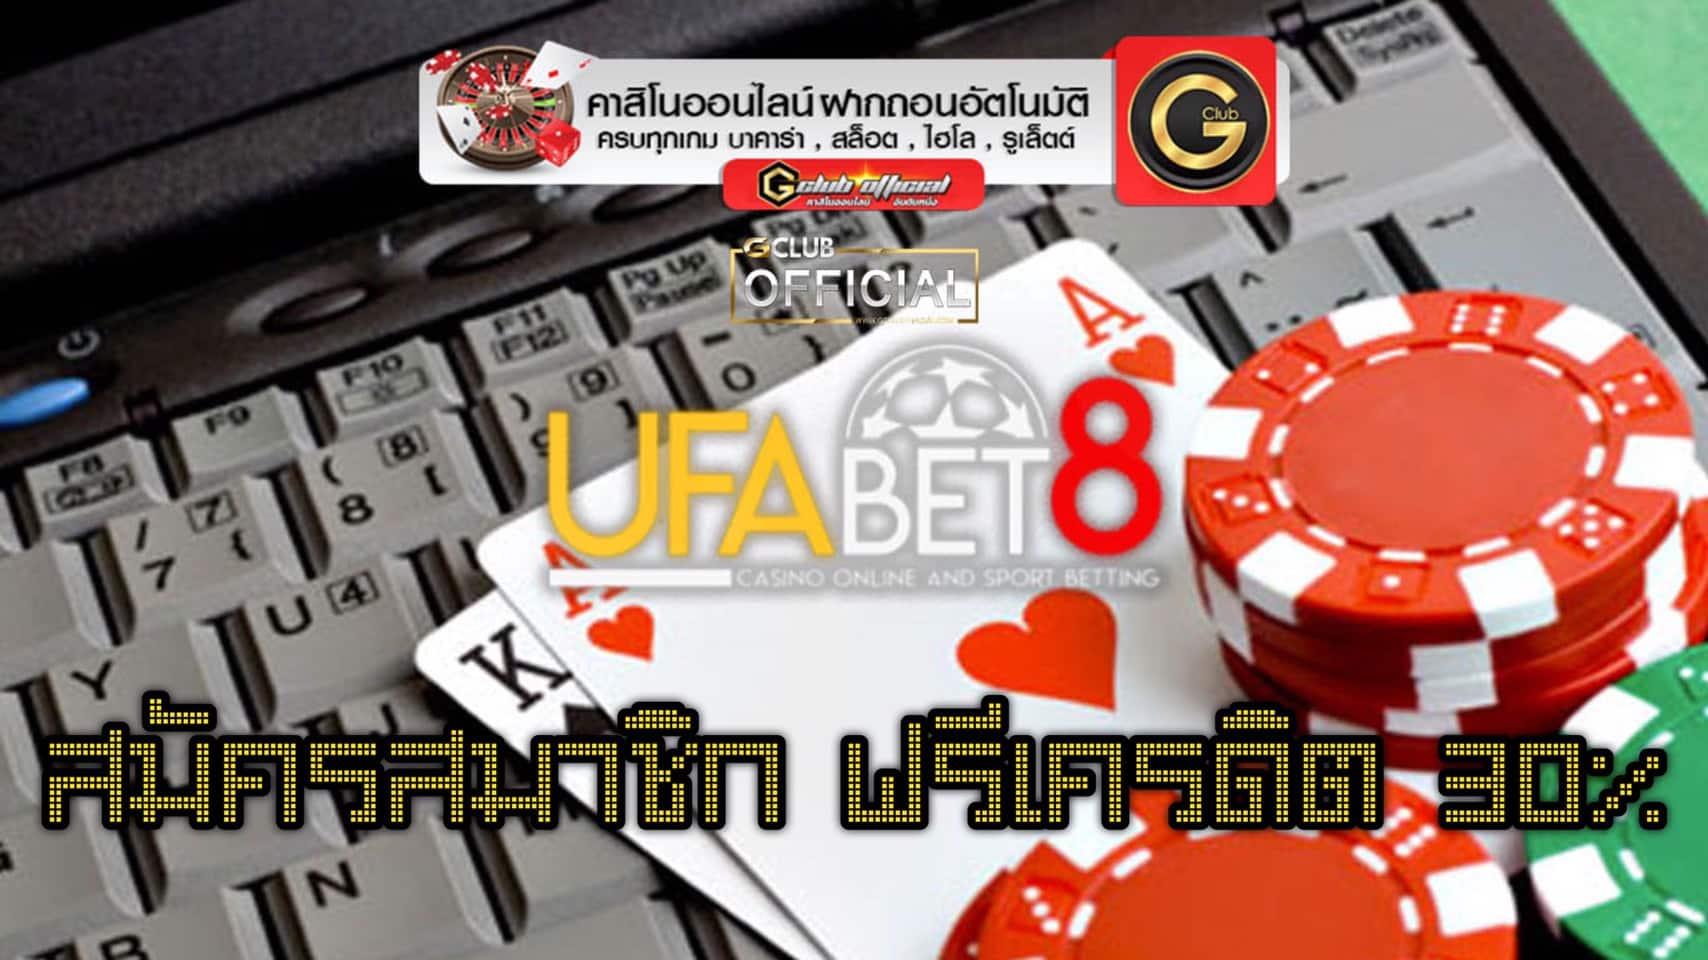 ufabet8 สมัครเข้าเล่น ฟรีเครดิต